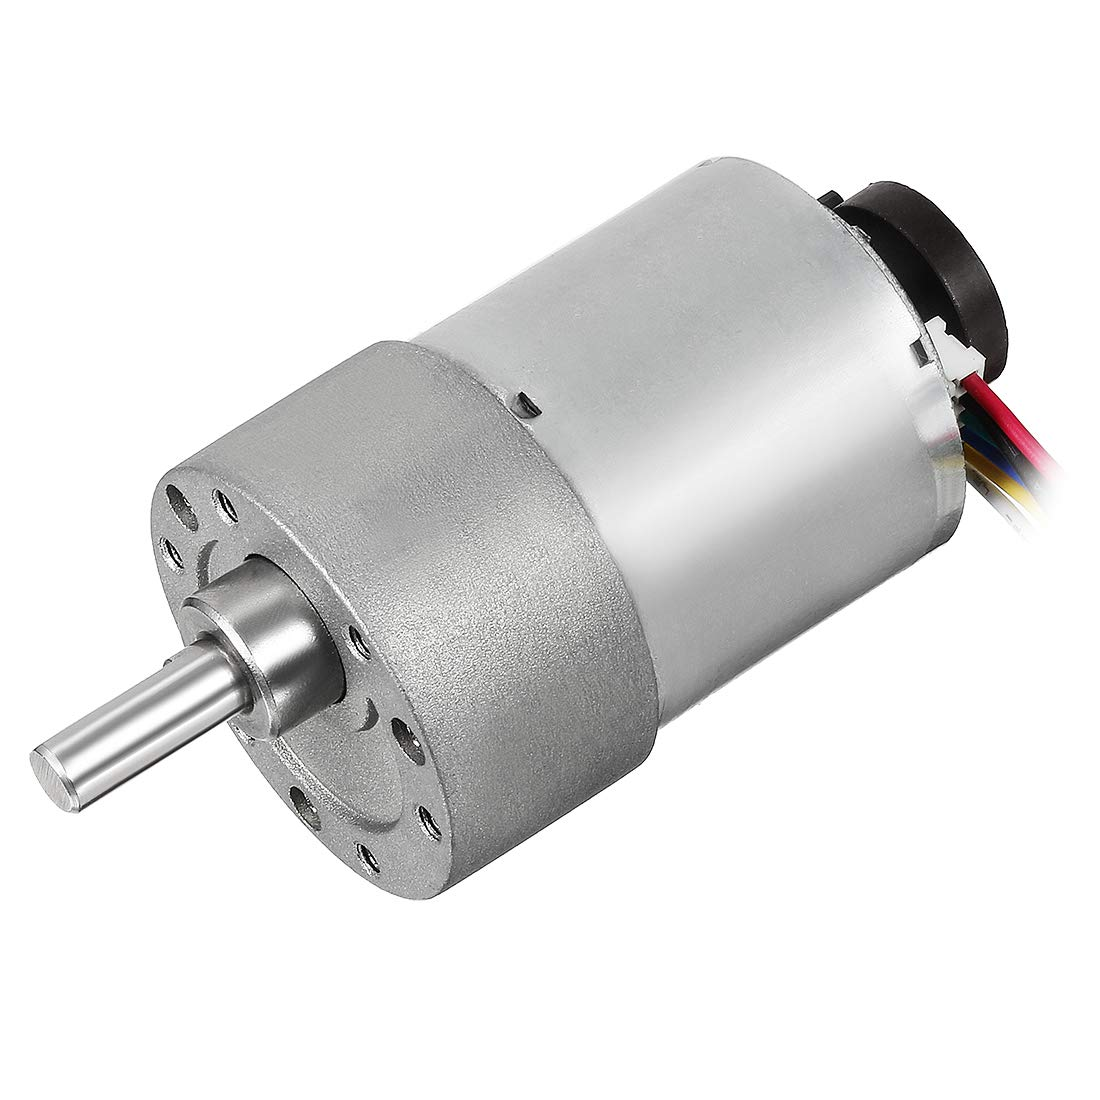 sourcing map 18.8: 1 Getriebemotor mit Encoder DC 24V 530RPM Getriebemotor 37Dx52L mm DE